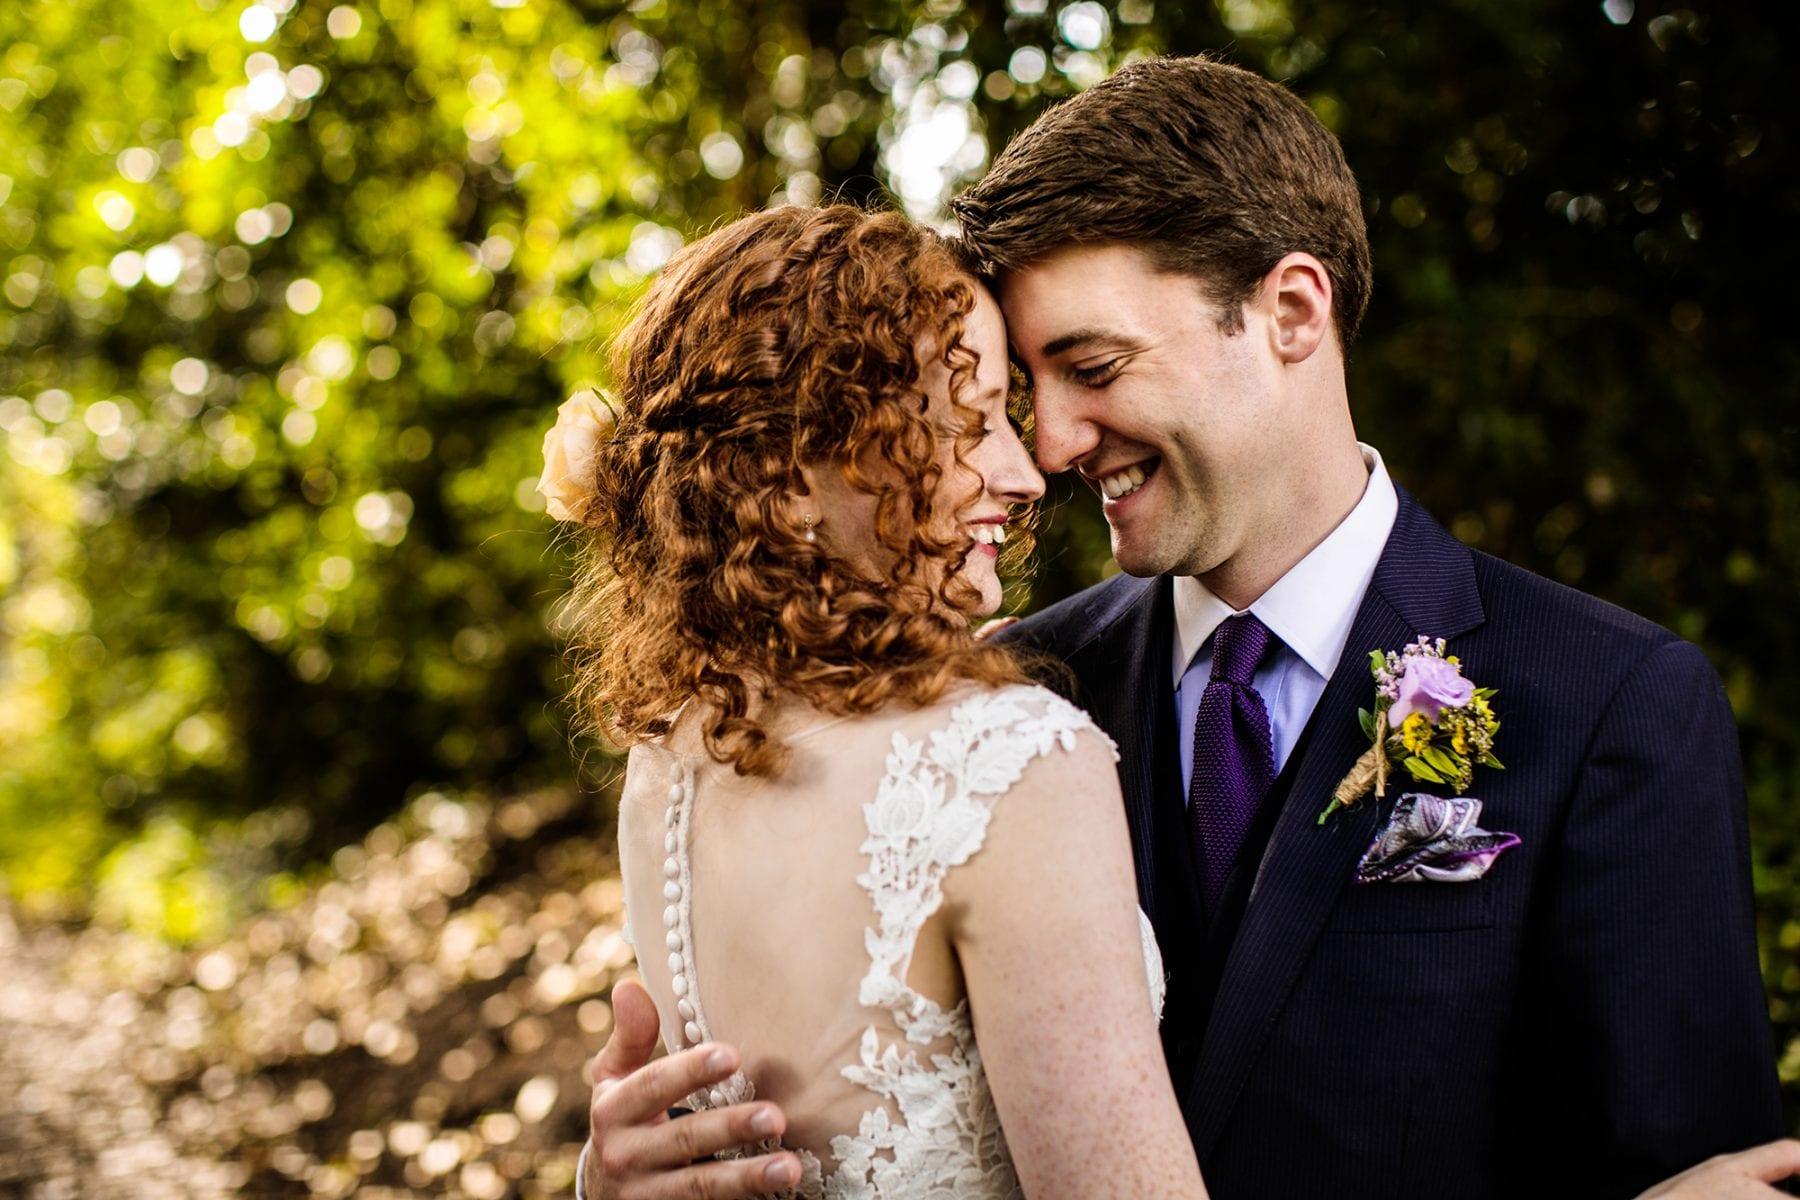 Colourful Wedding Photographs Cheshire